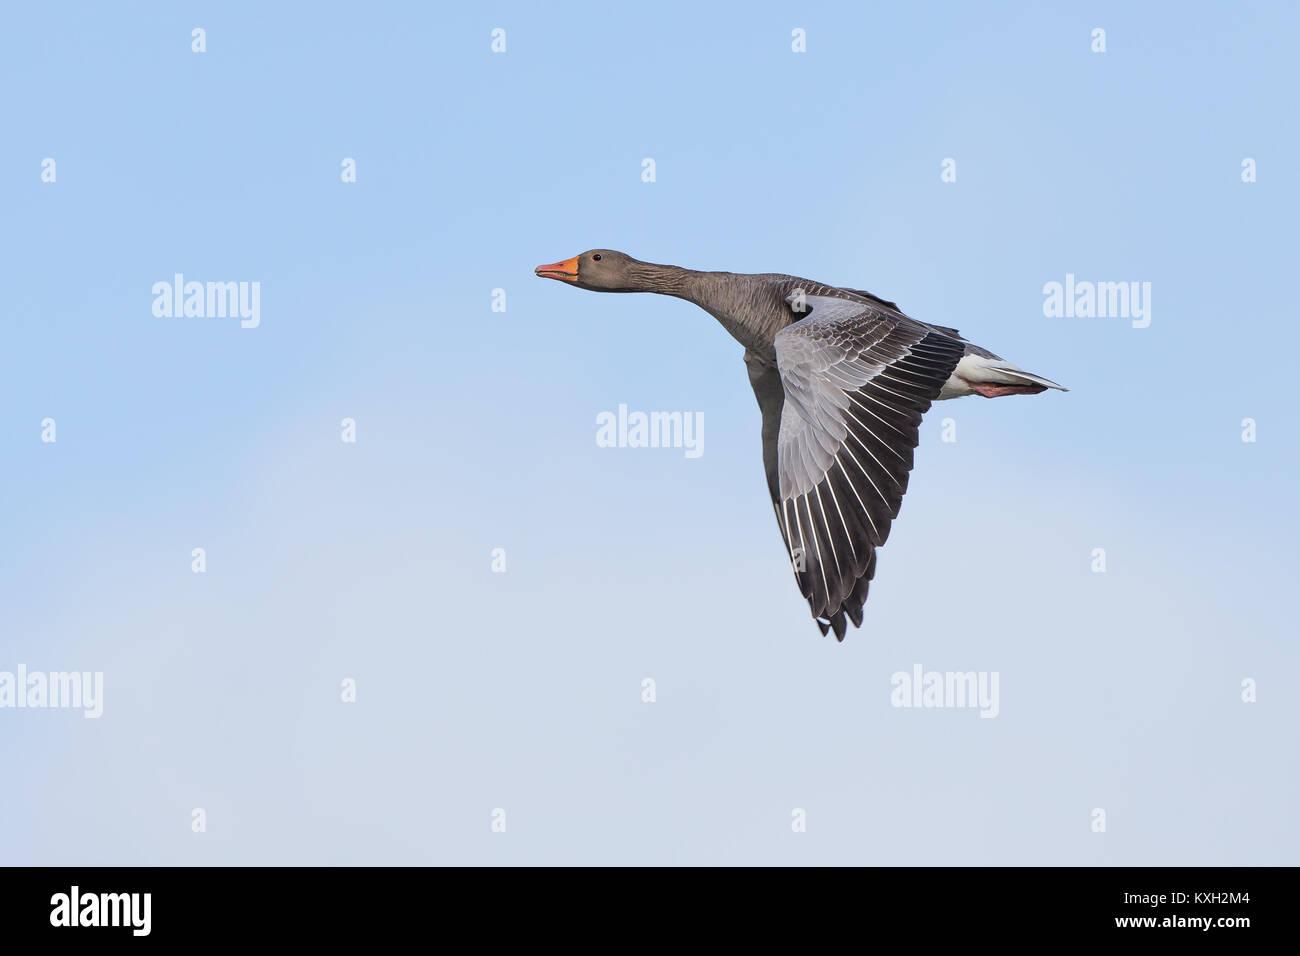 Solo graylag goose (Anser anser) en vuelo en claro, azul cielo. Cuello estirado, volando hacia arriba, las alas Imagen De Stock